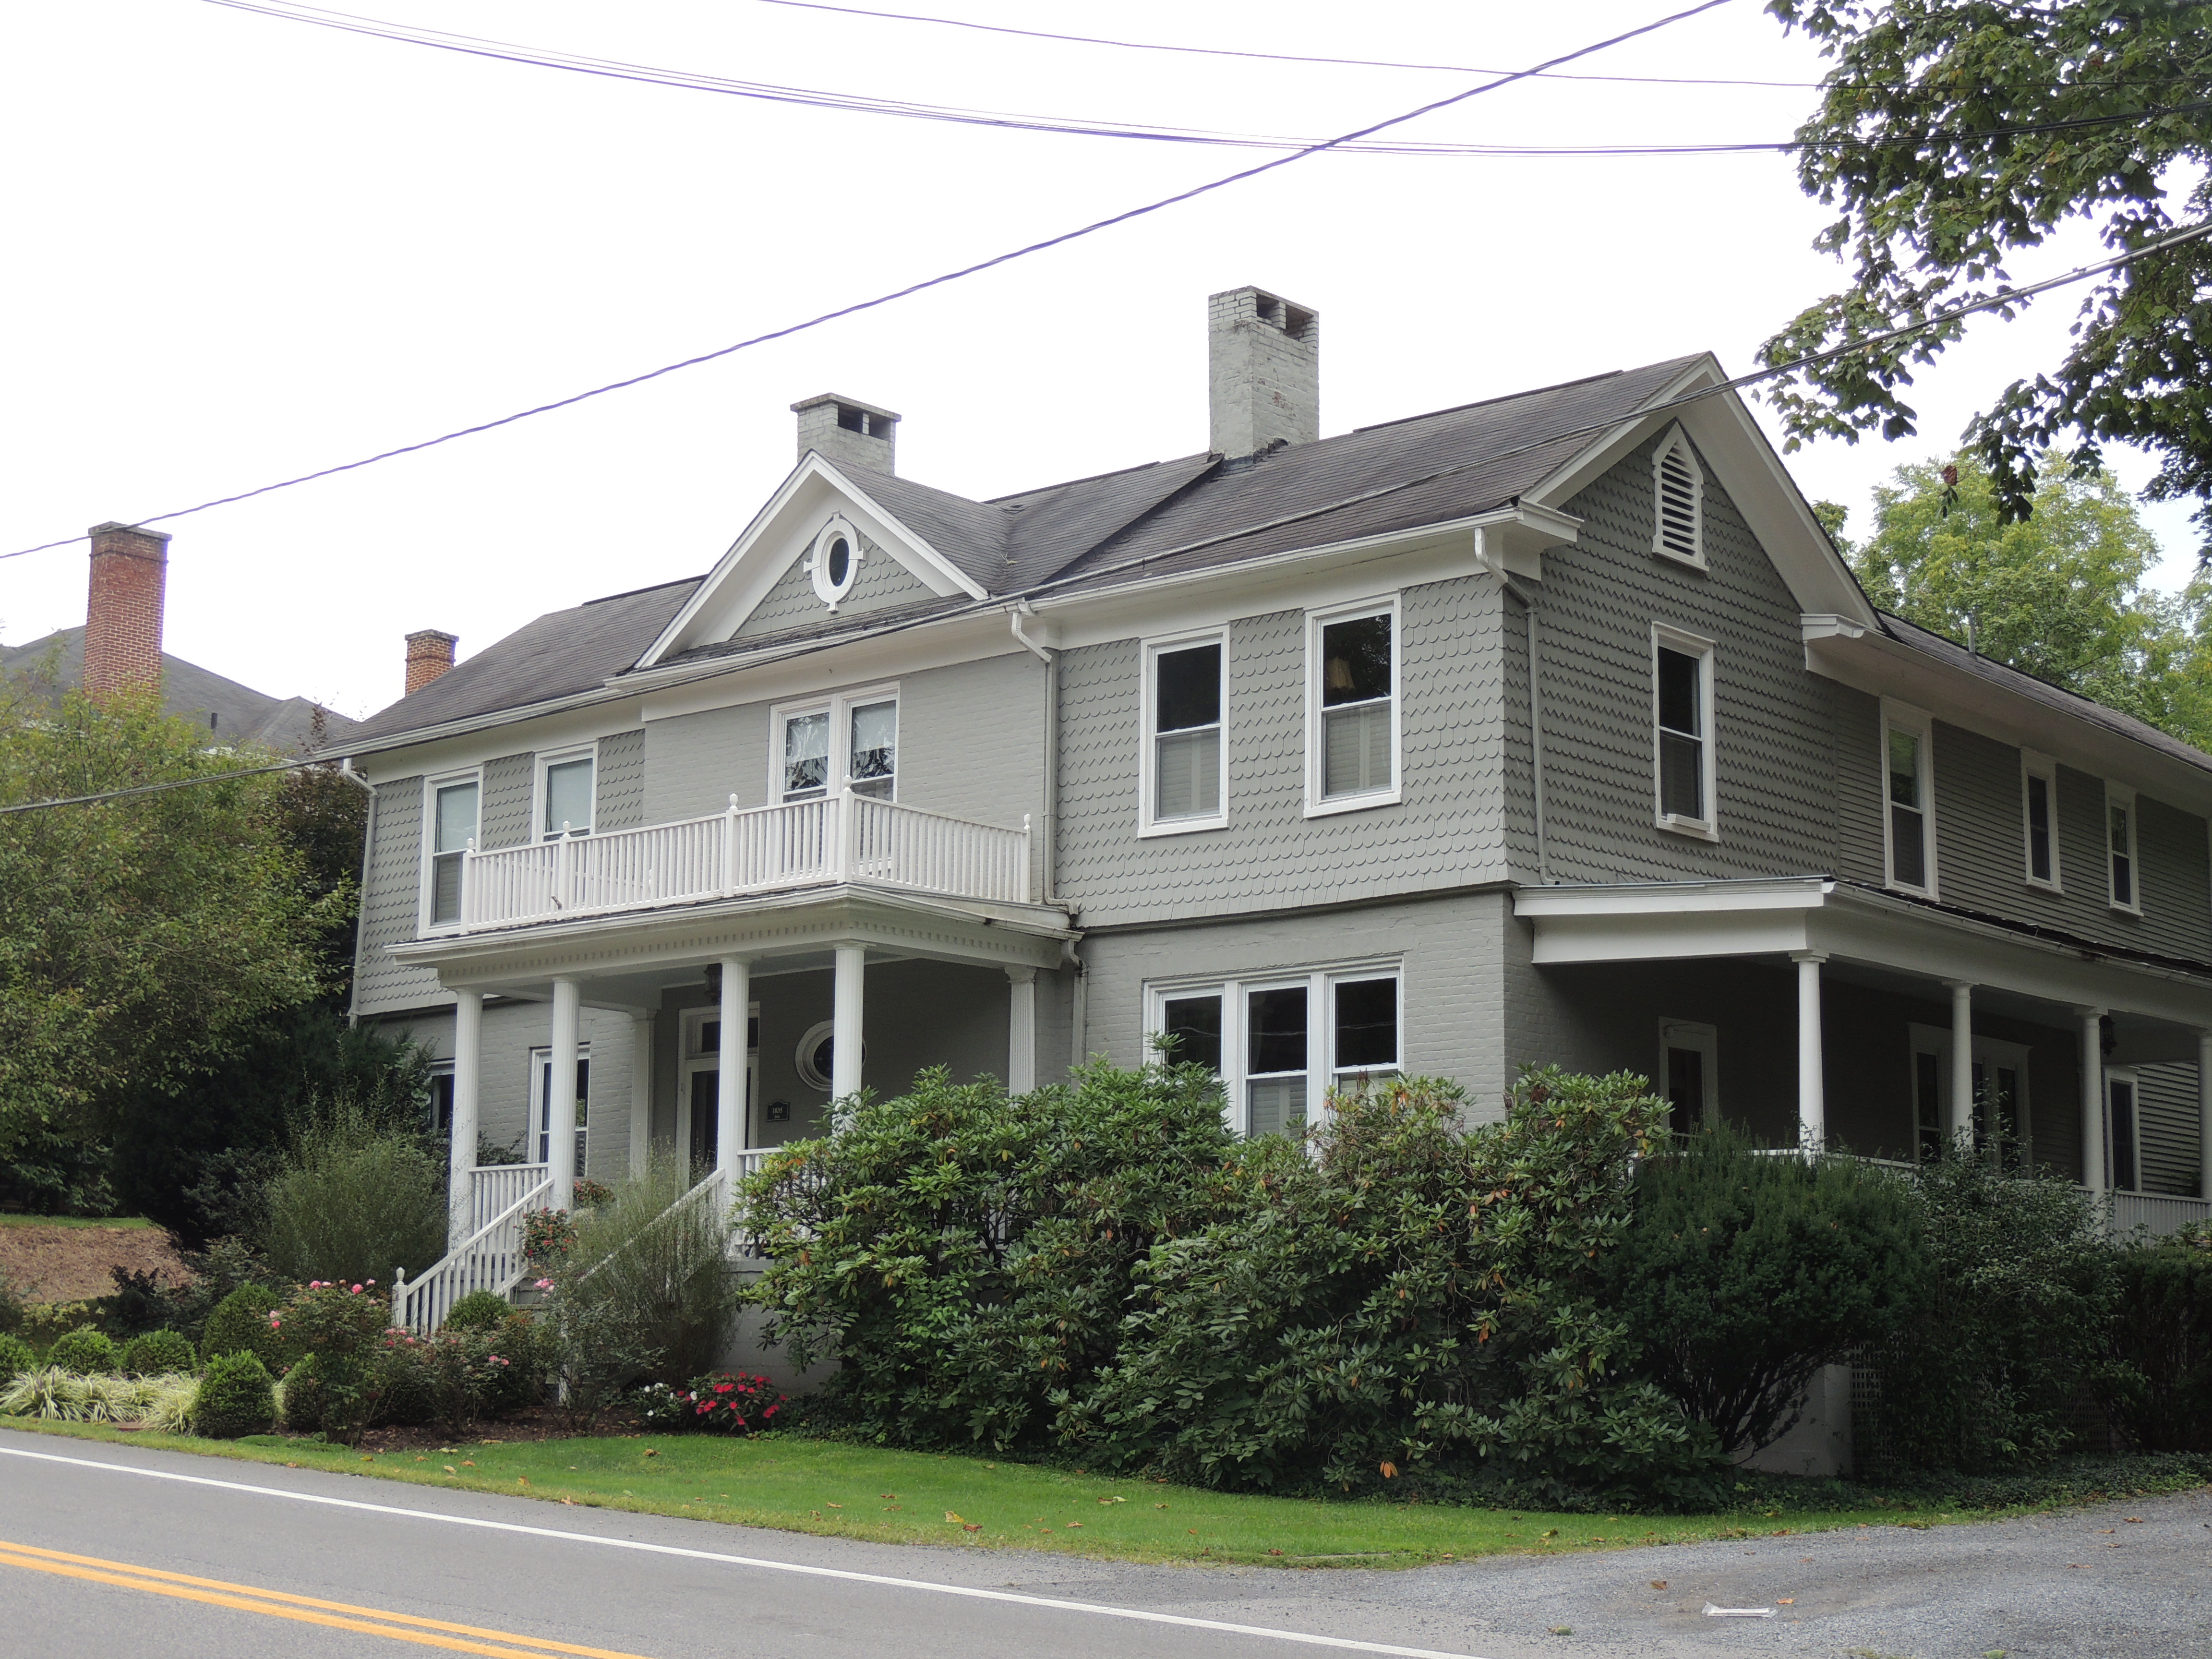 Stalnaker House